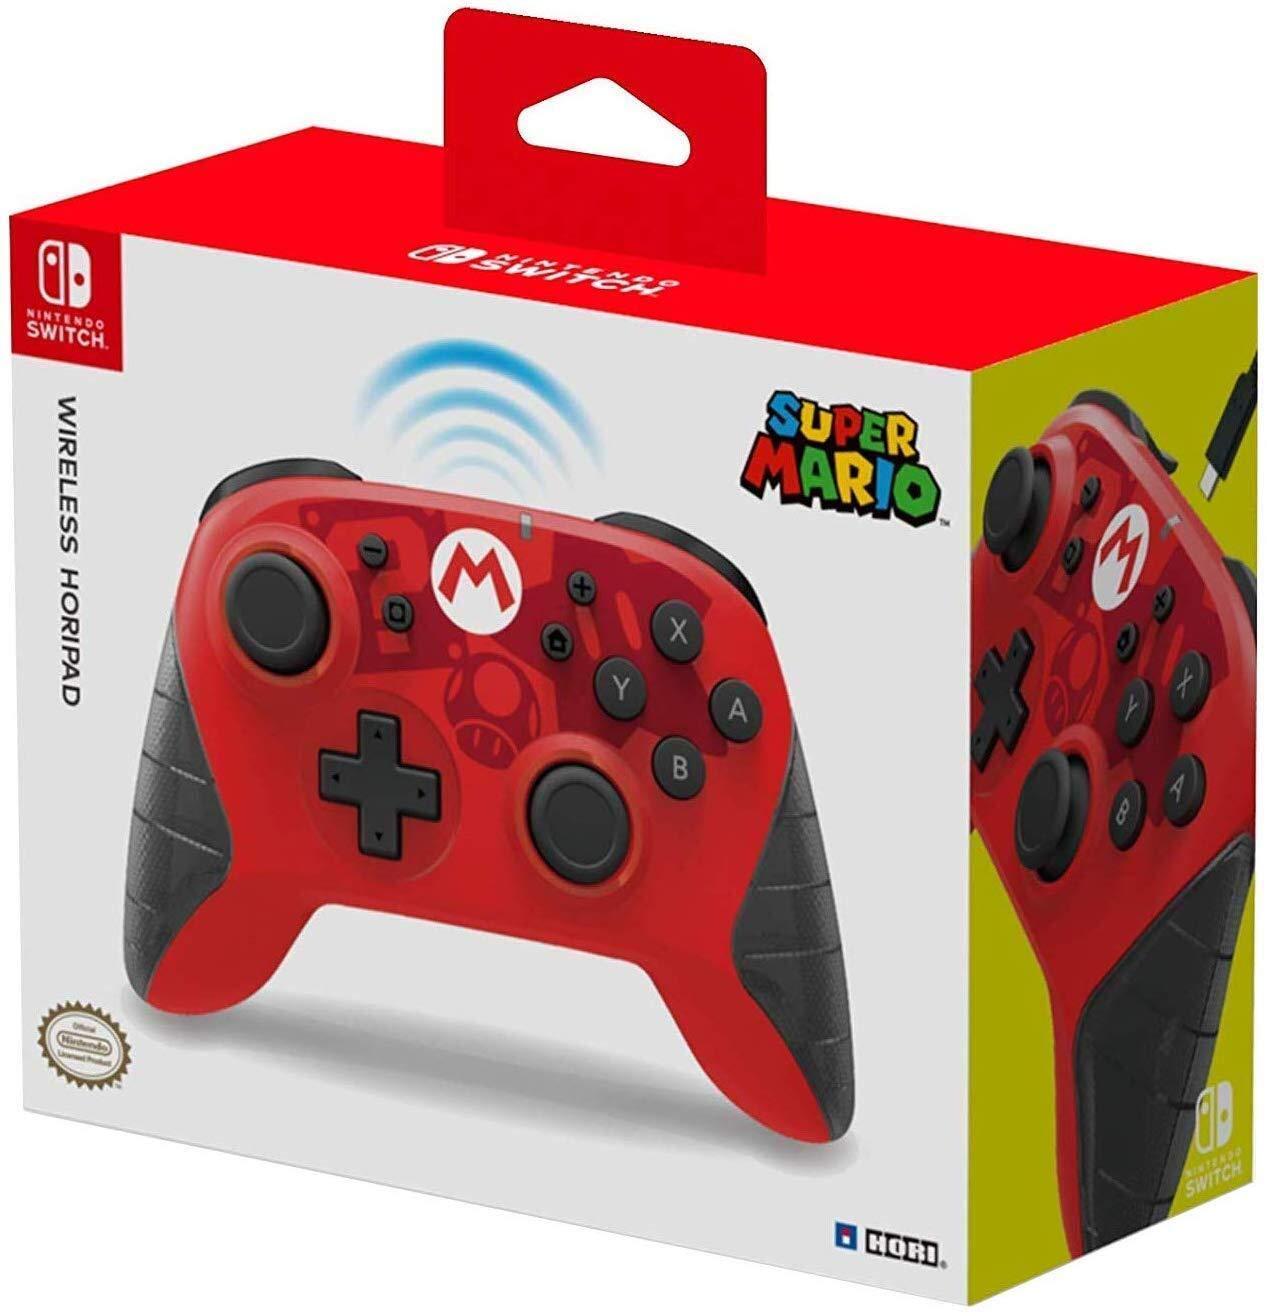 Hori Wireless Horipad für Nintendo Switch - Super Mario (BT, USB-C, ~15h Akku, inkl. Beschleunigungs-/Bewegungssensor, ohne Vibration & NFC)